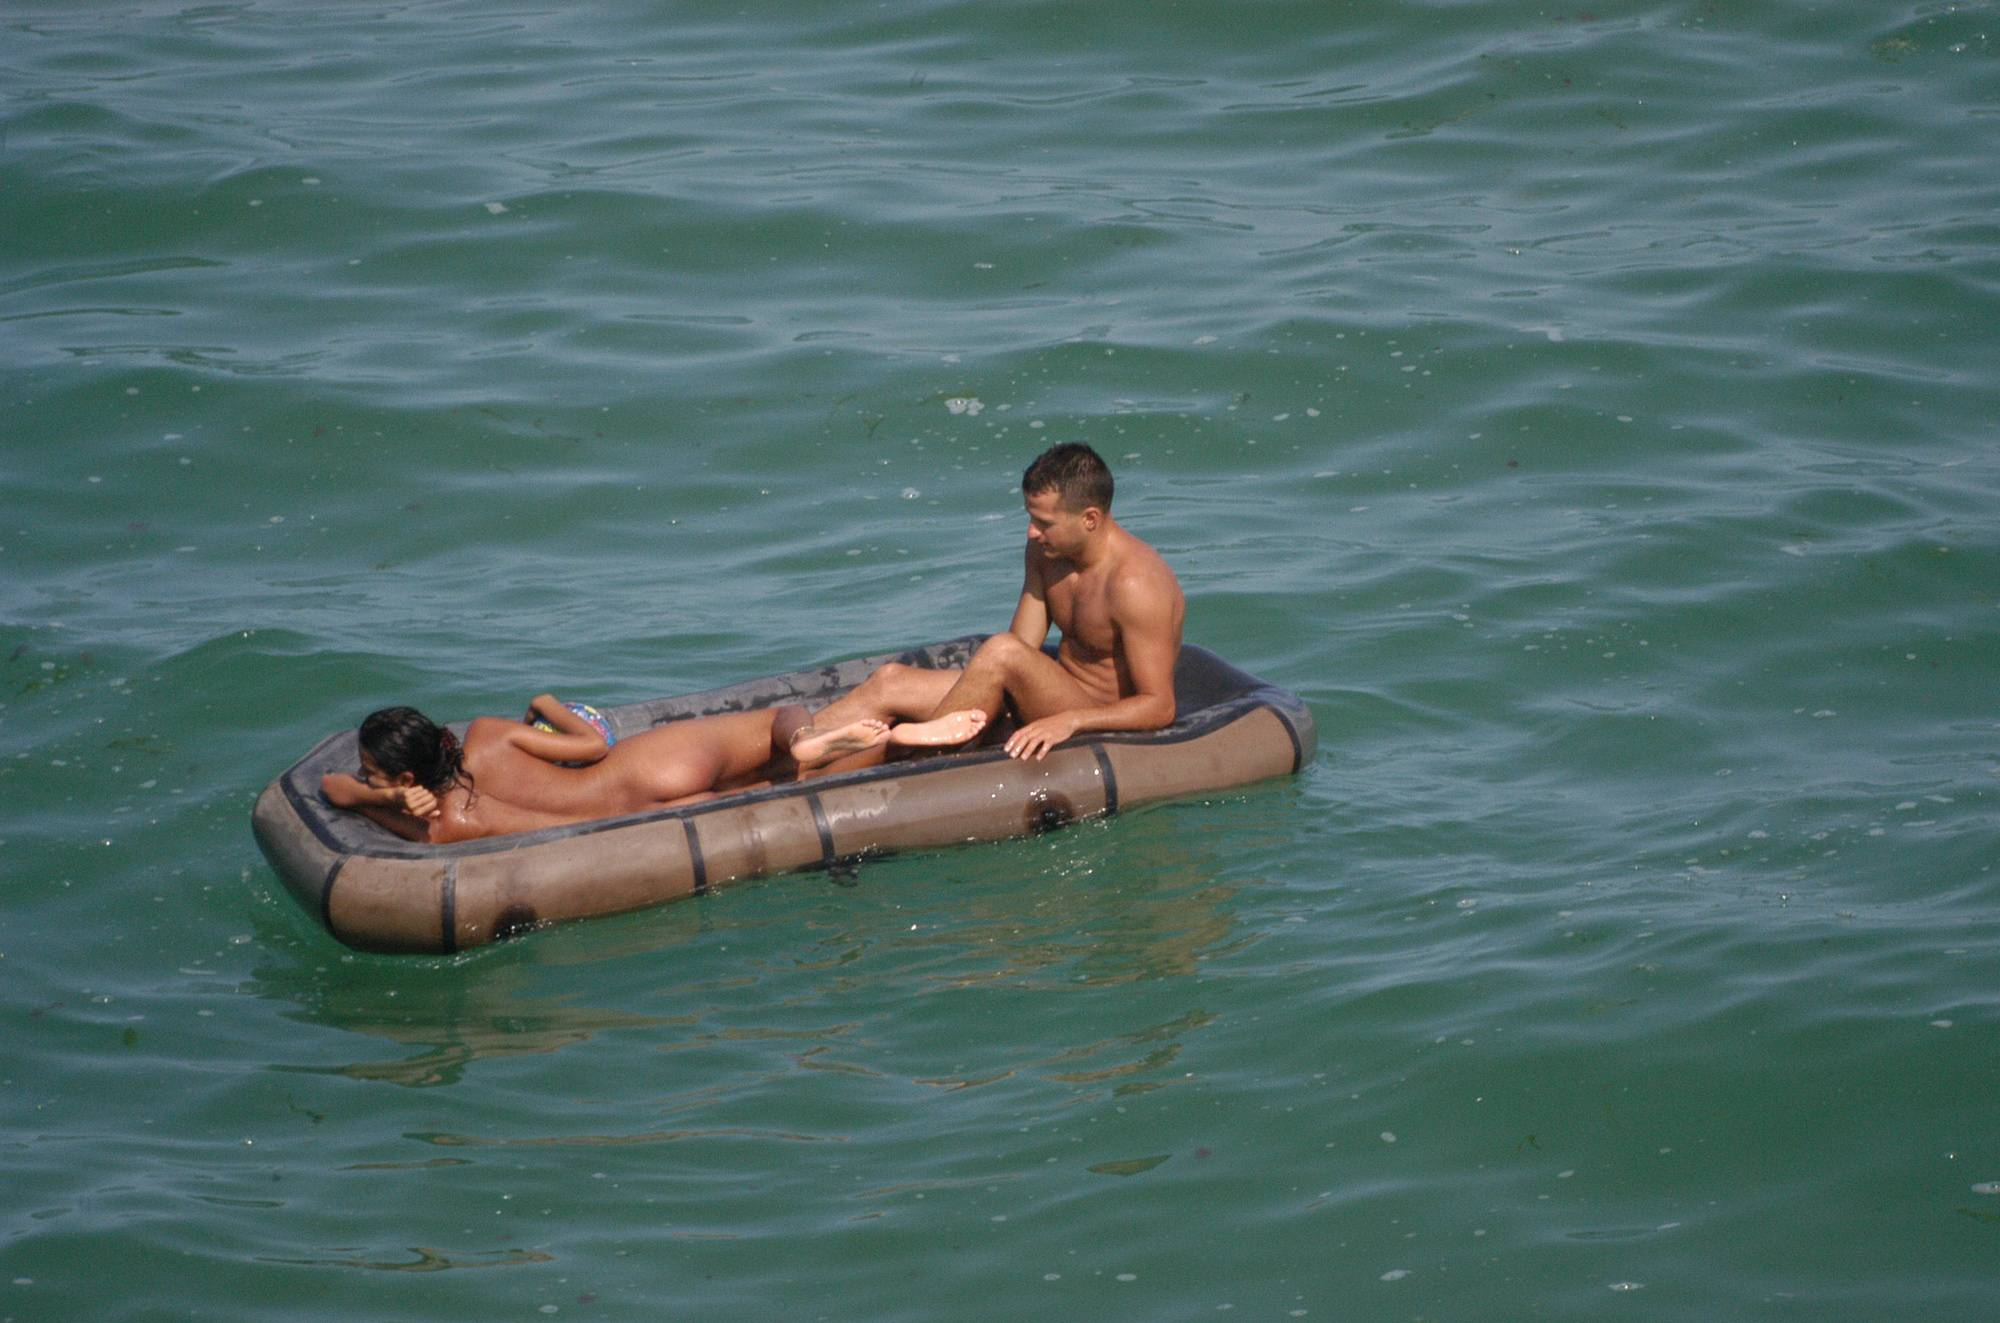 Nudist Pictures Verna Exotic Couple Water - 2